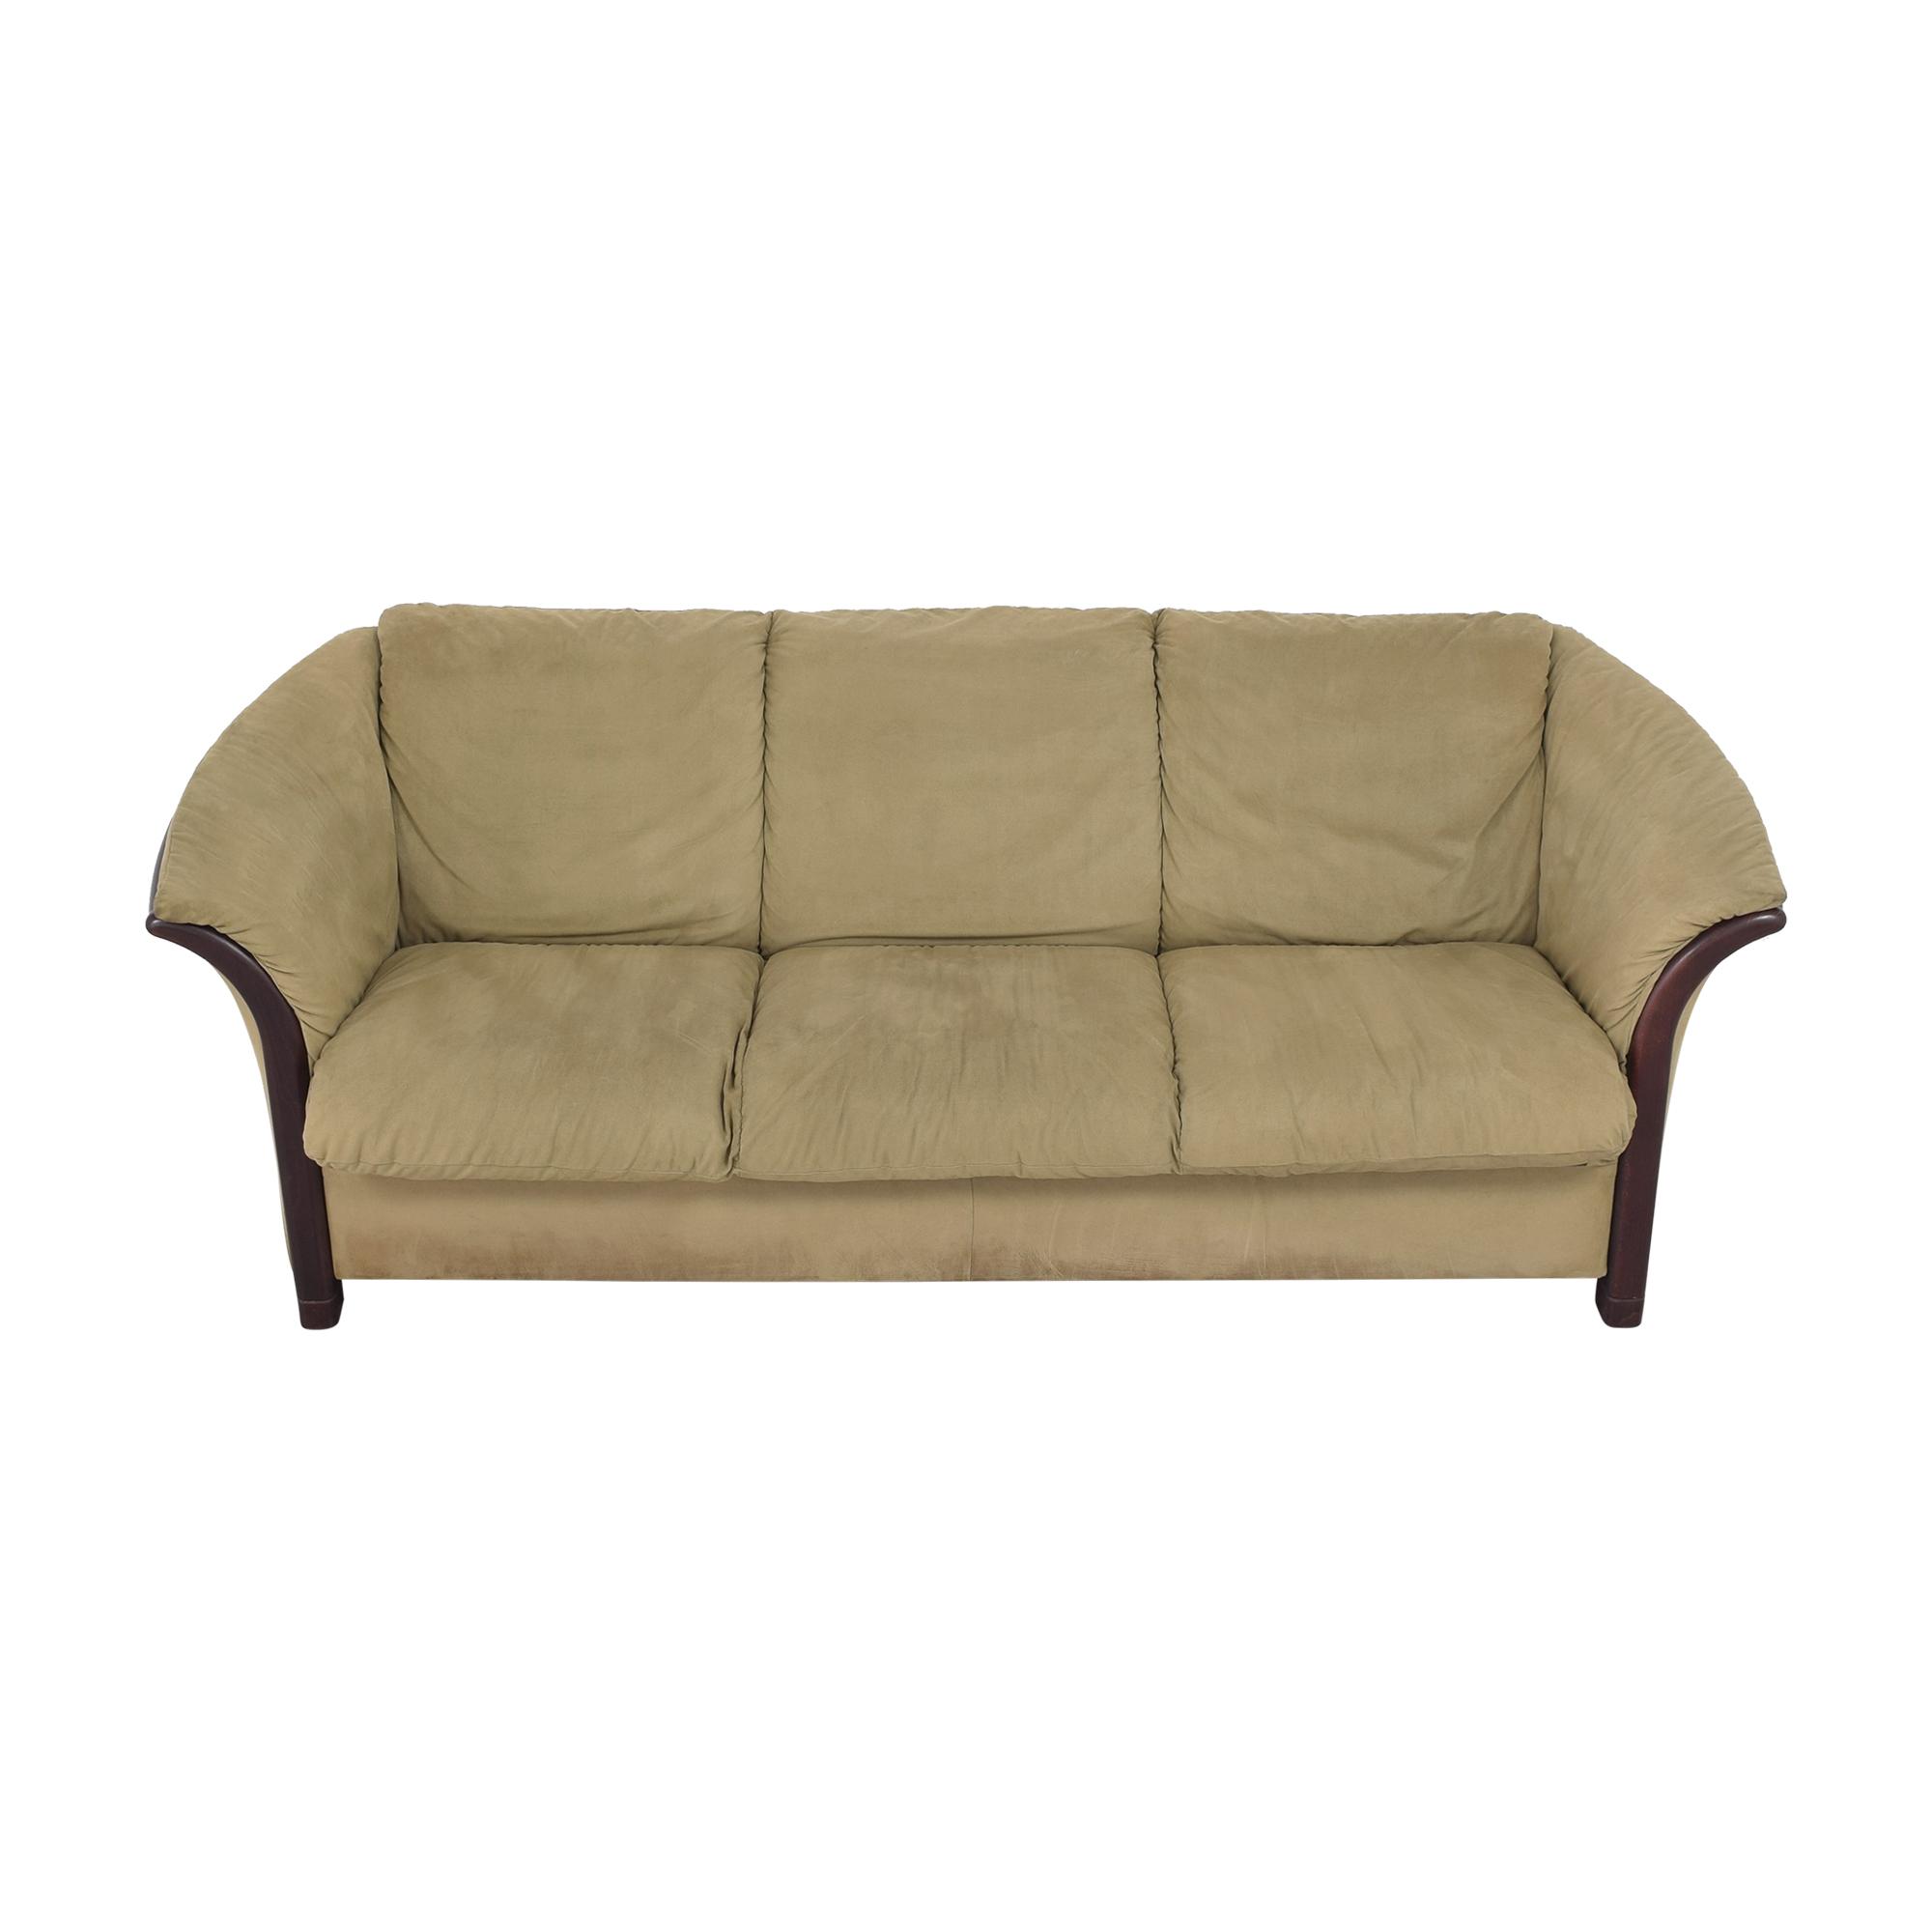 Ekornes Ekornes Manhattan Three Seat Sofa Classic Sofas